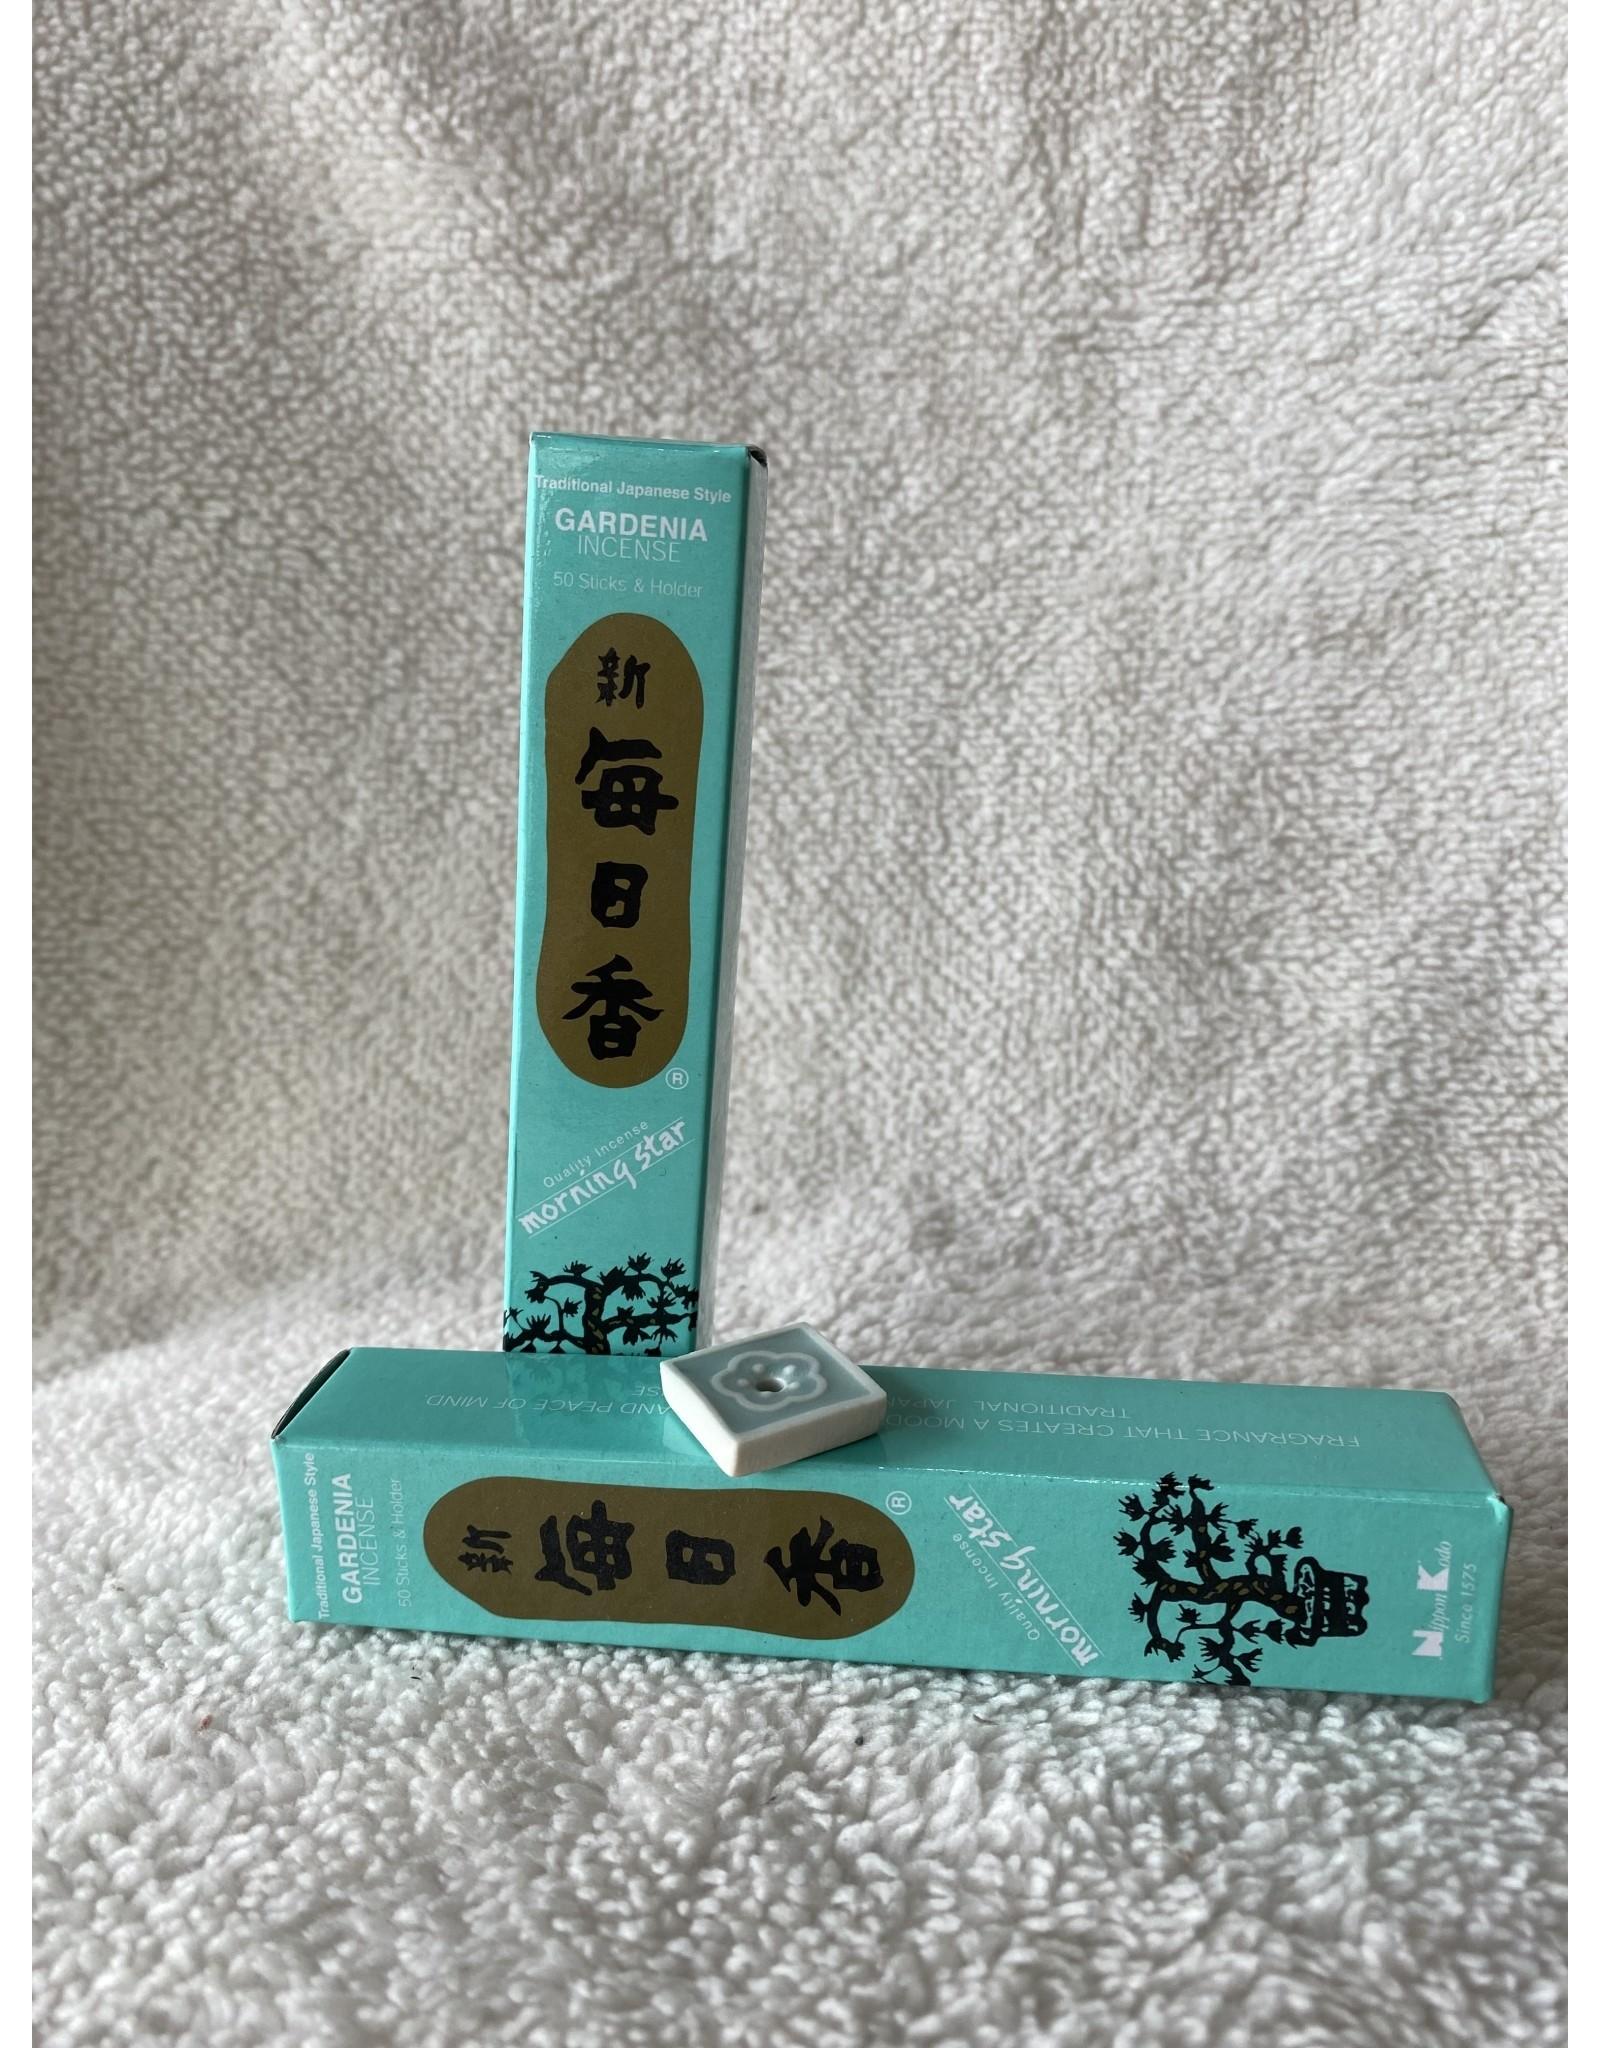 Morning Star Incense Sticks 50 ct. | Gardenia